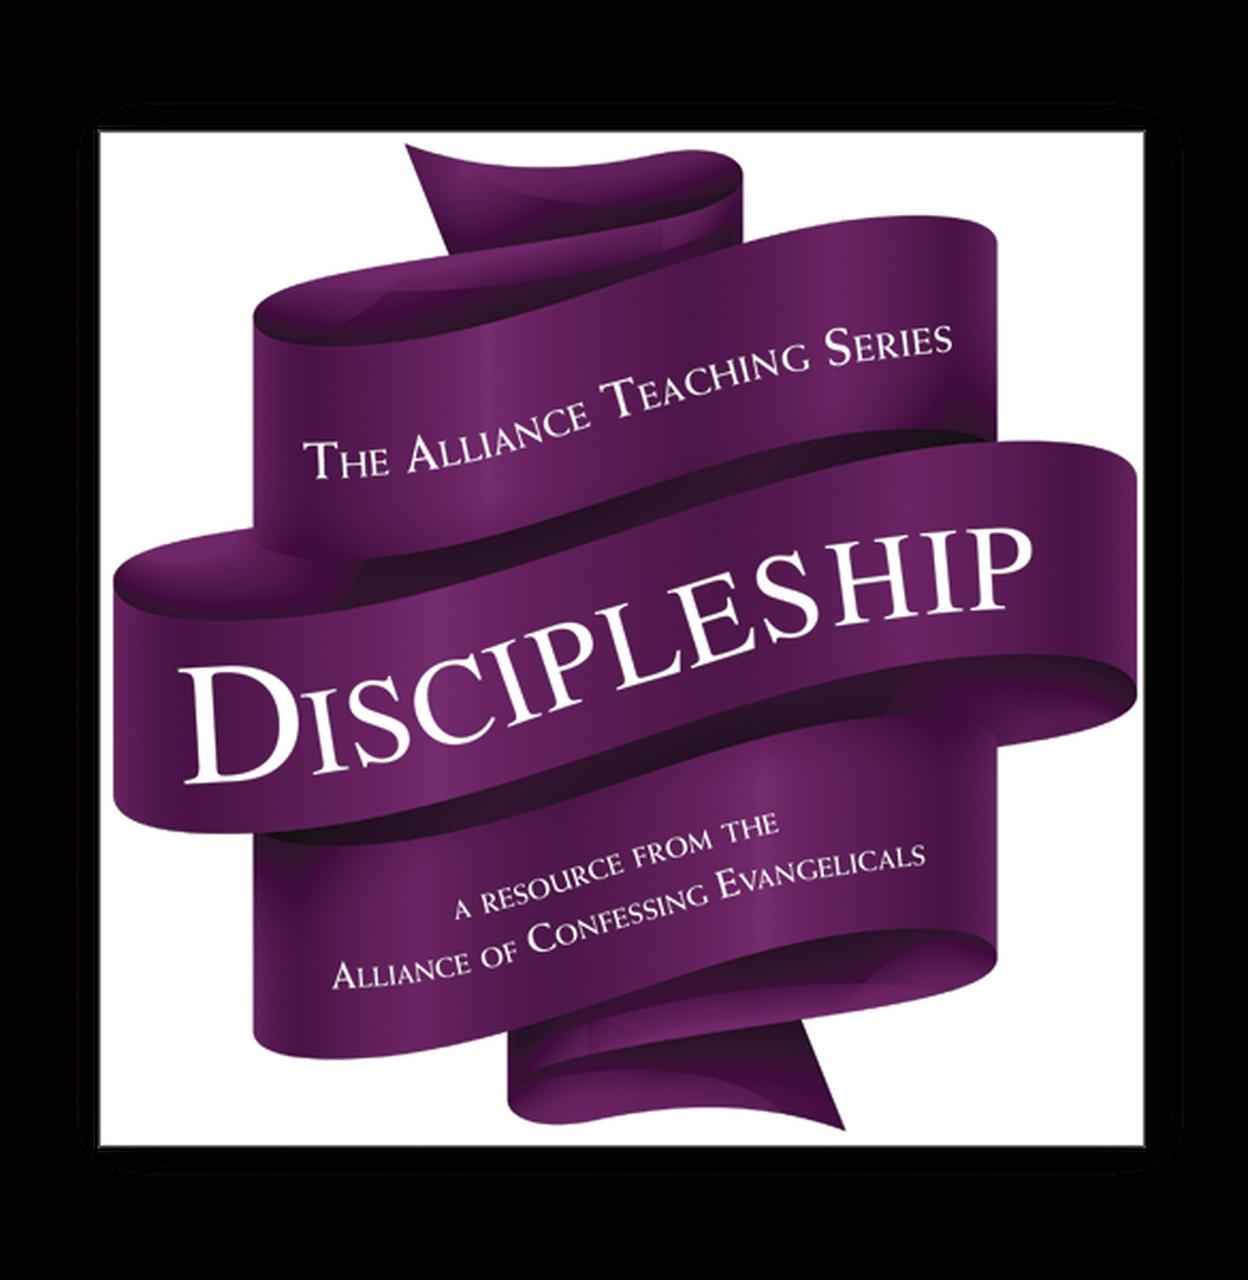 Alliance Teaching Series